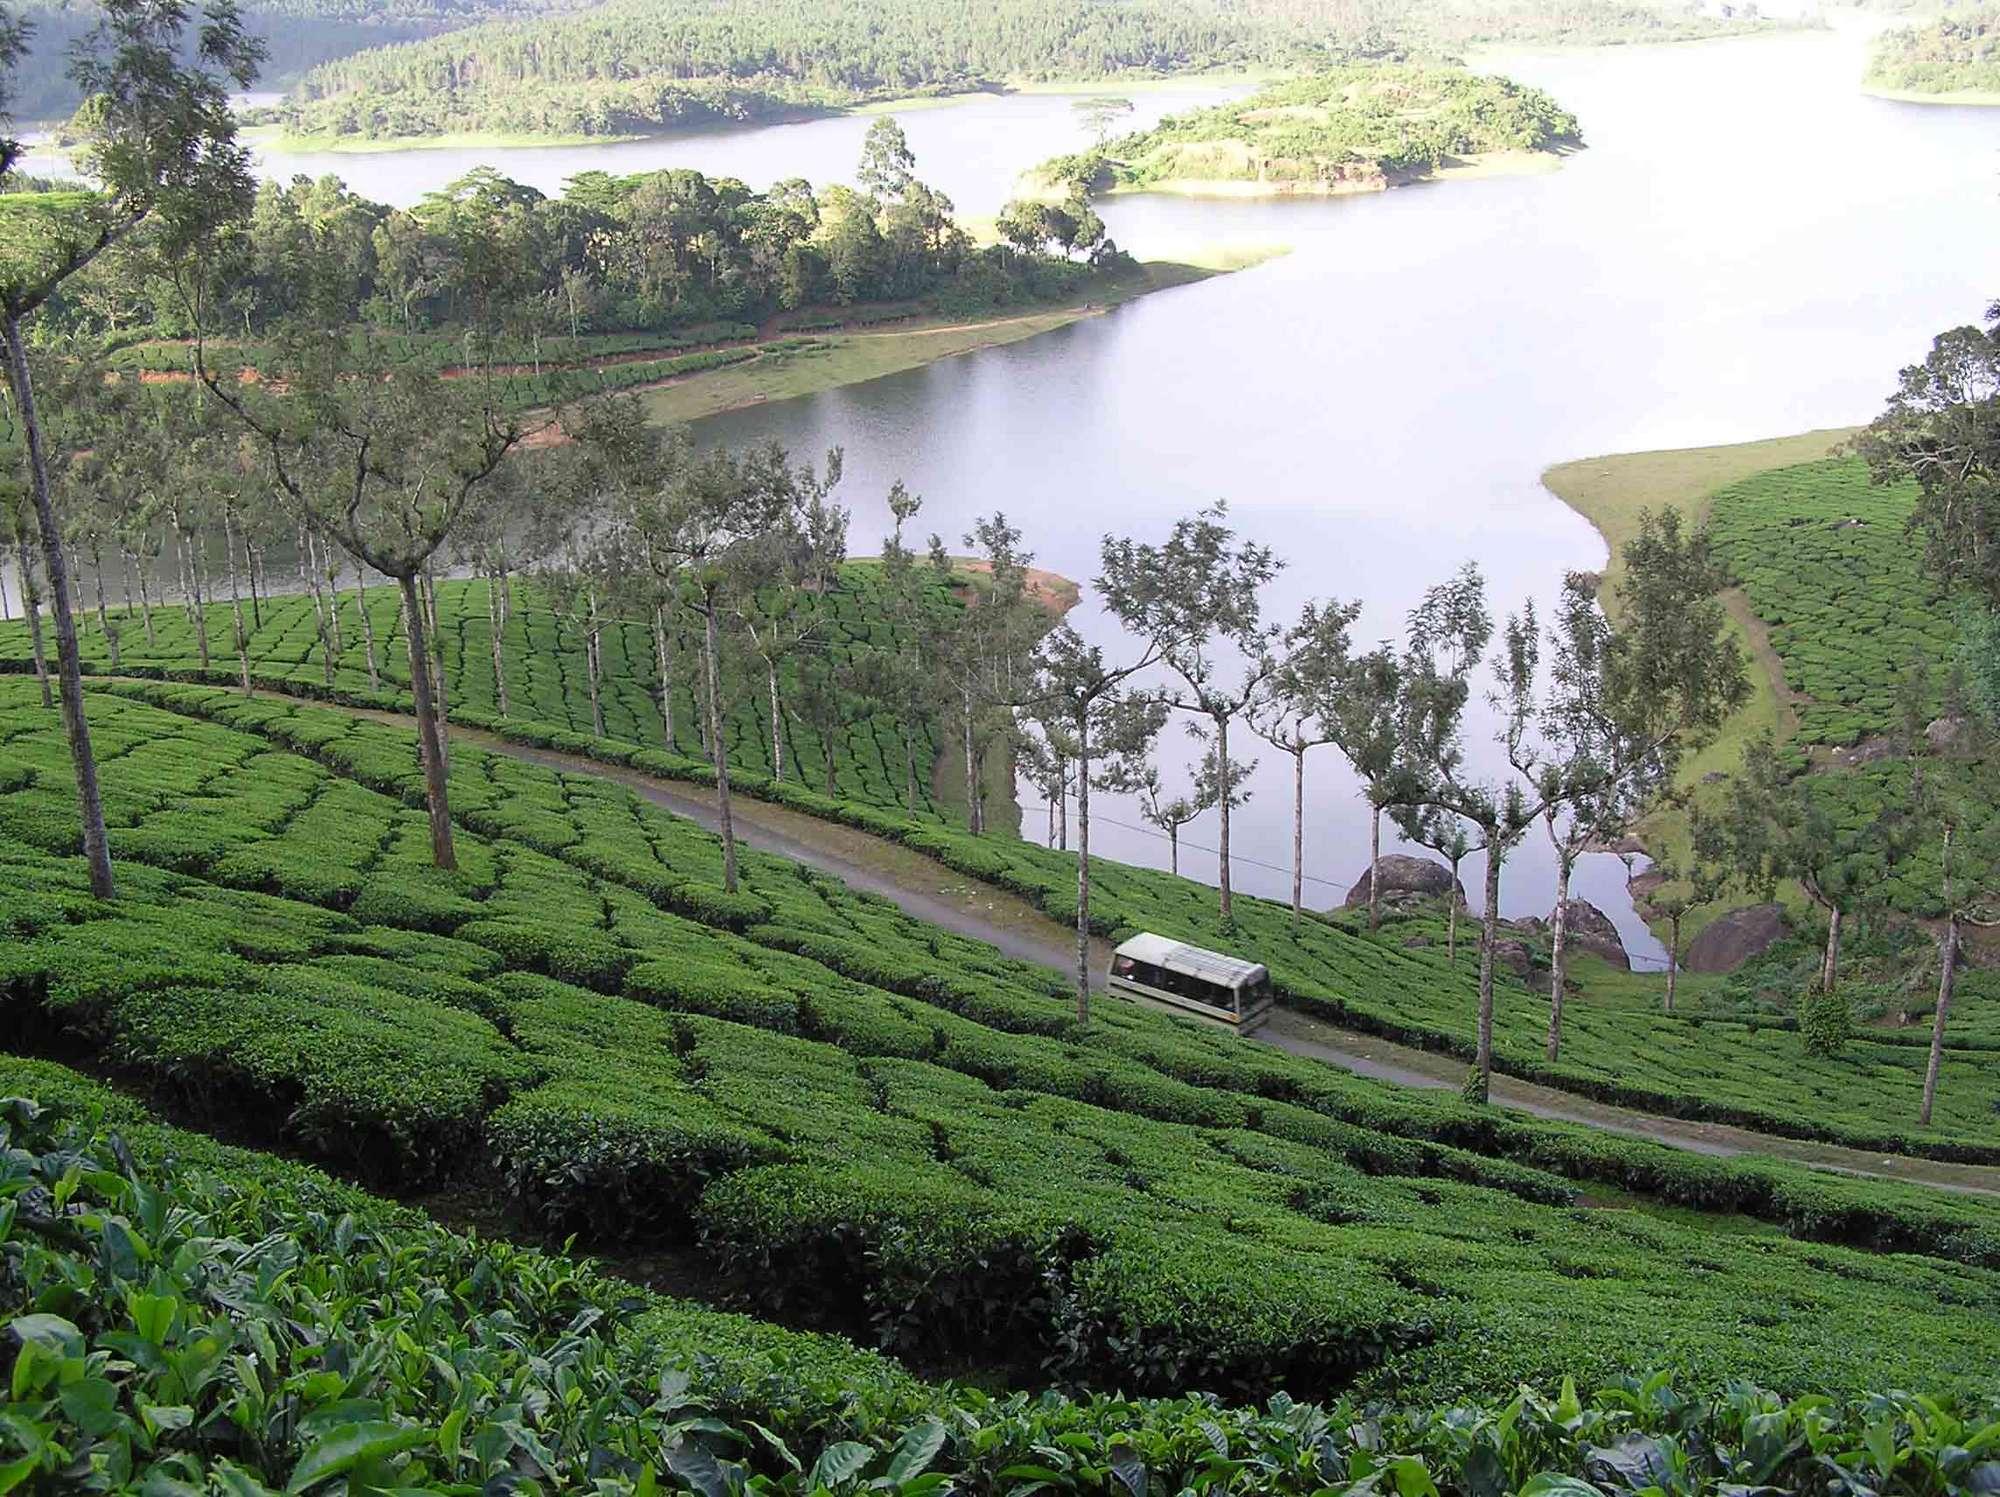 Munnar - Top 10 Places To Visit In Kerala